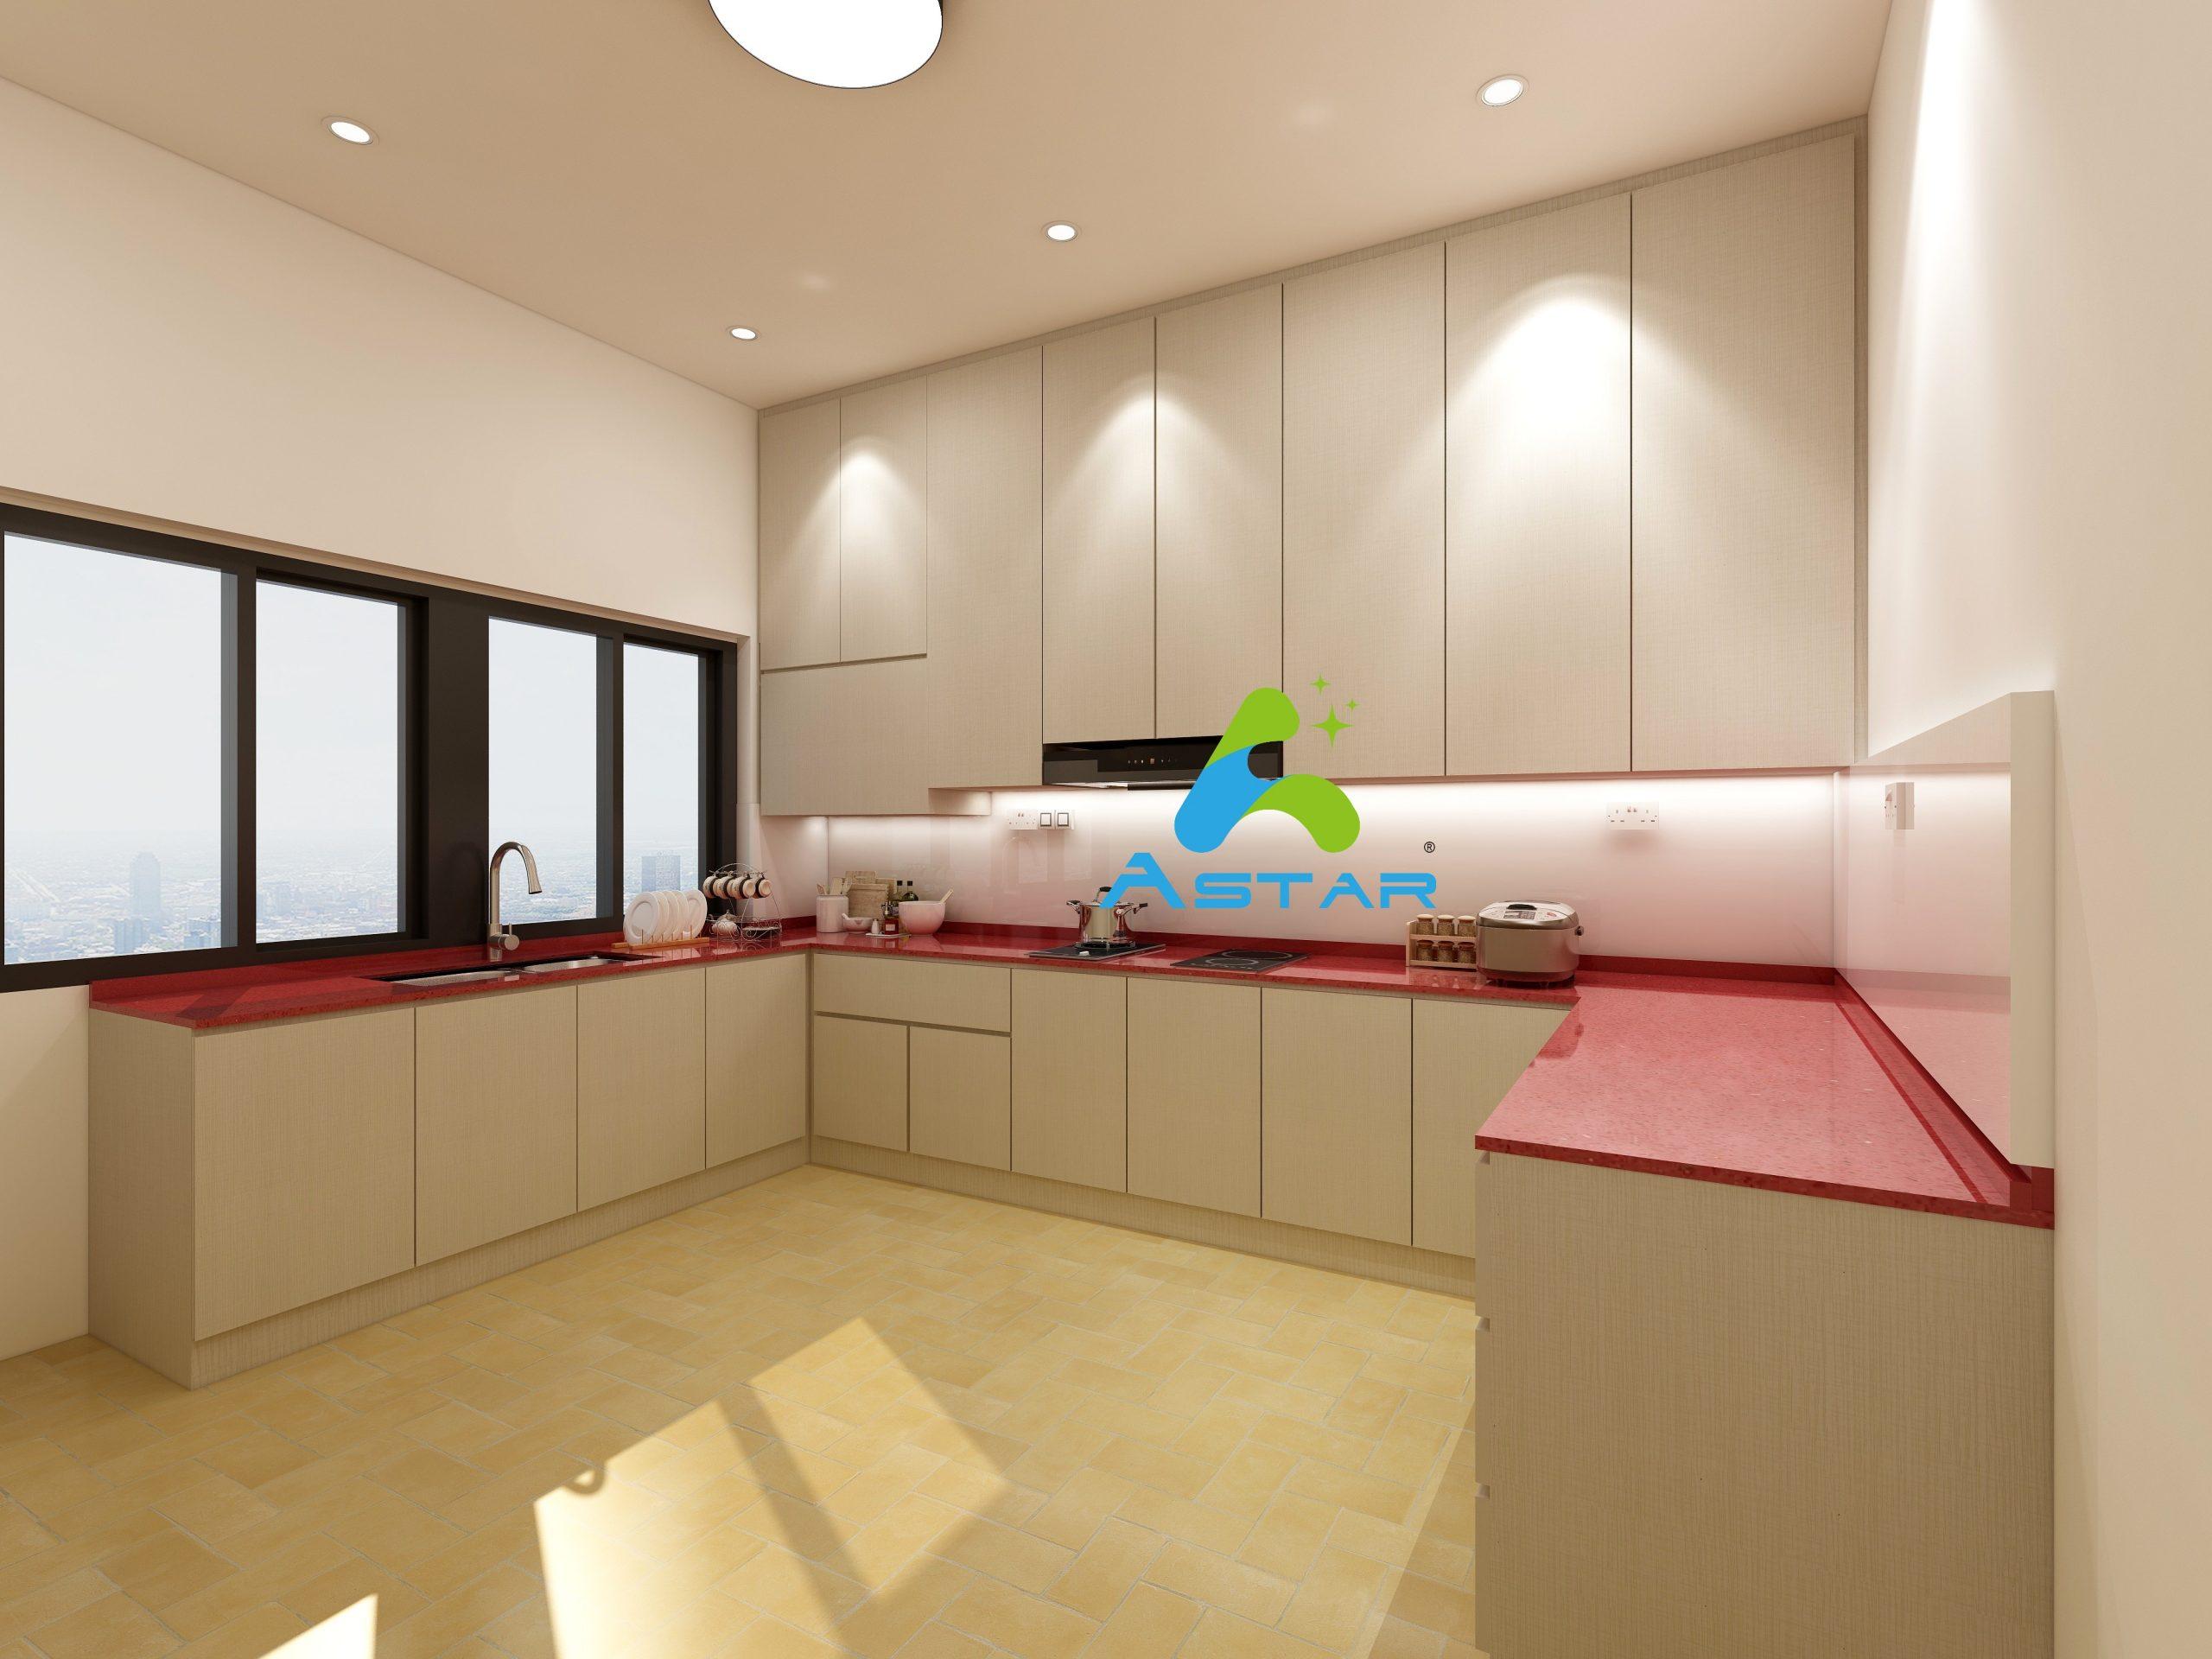 astar furnishing complete projects aluminium kitchen cabinet vanity cabinet wardrobe Jalan Binchang 2